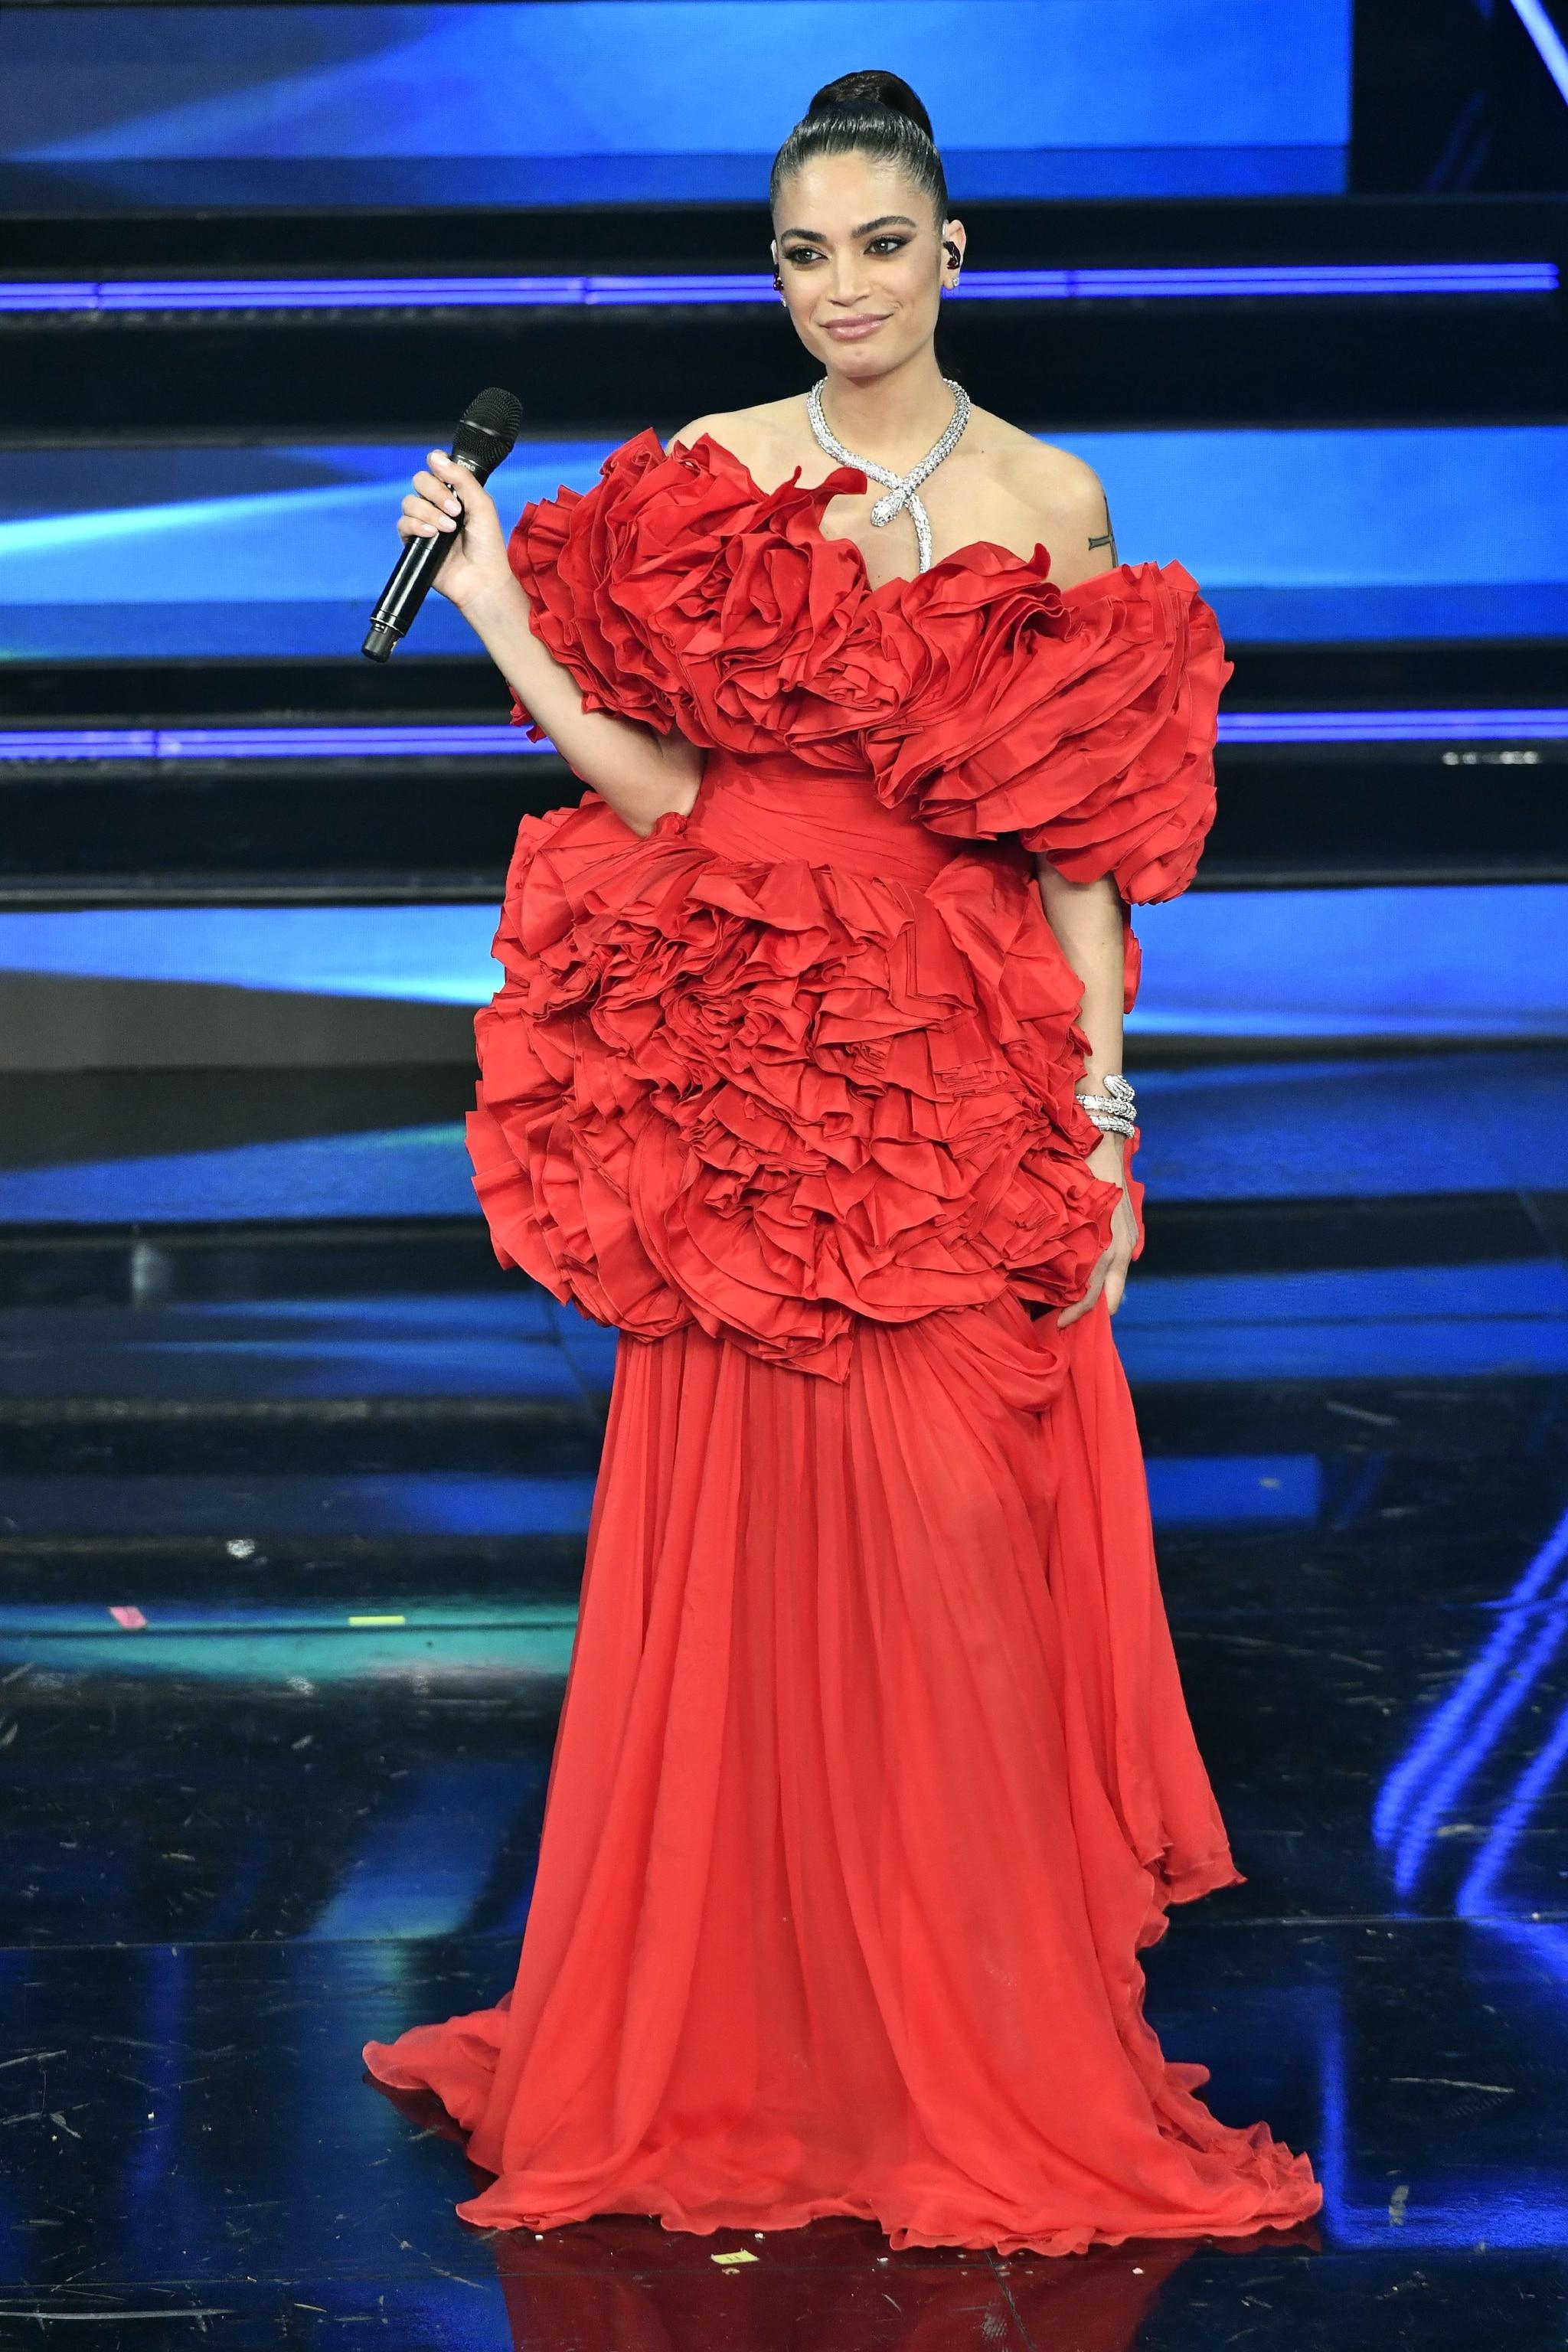 Elodie in Giambattista Valli Haute Couture